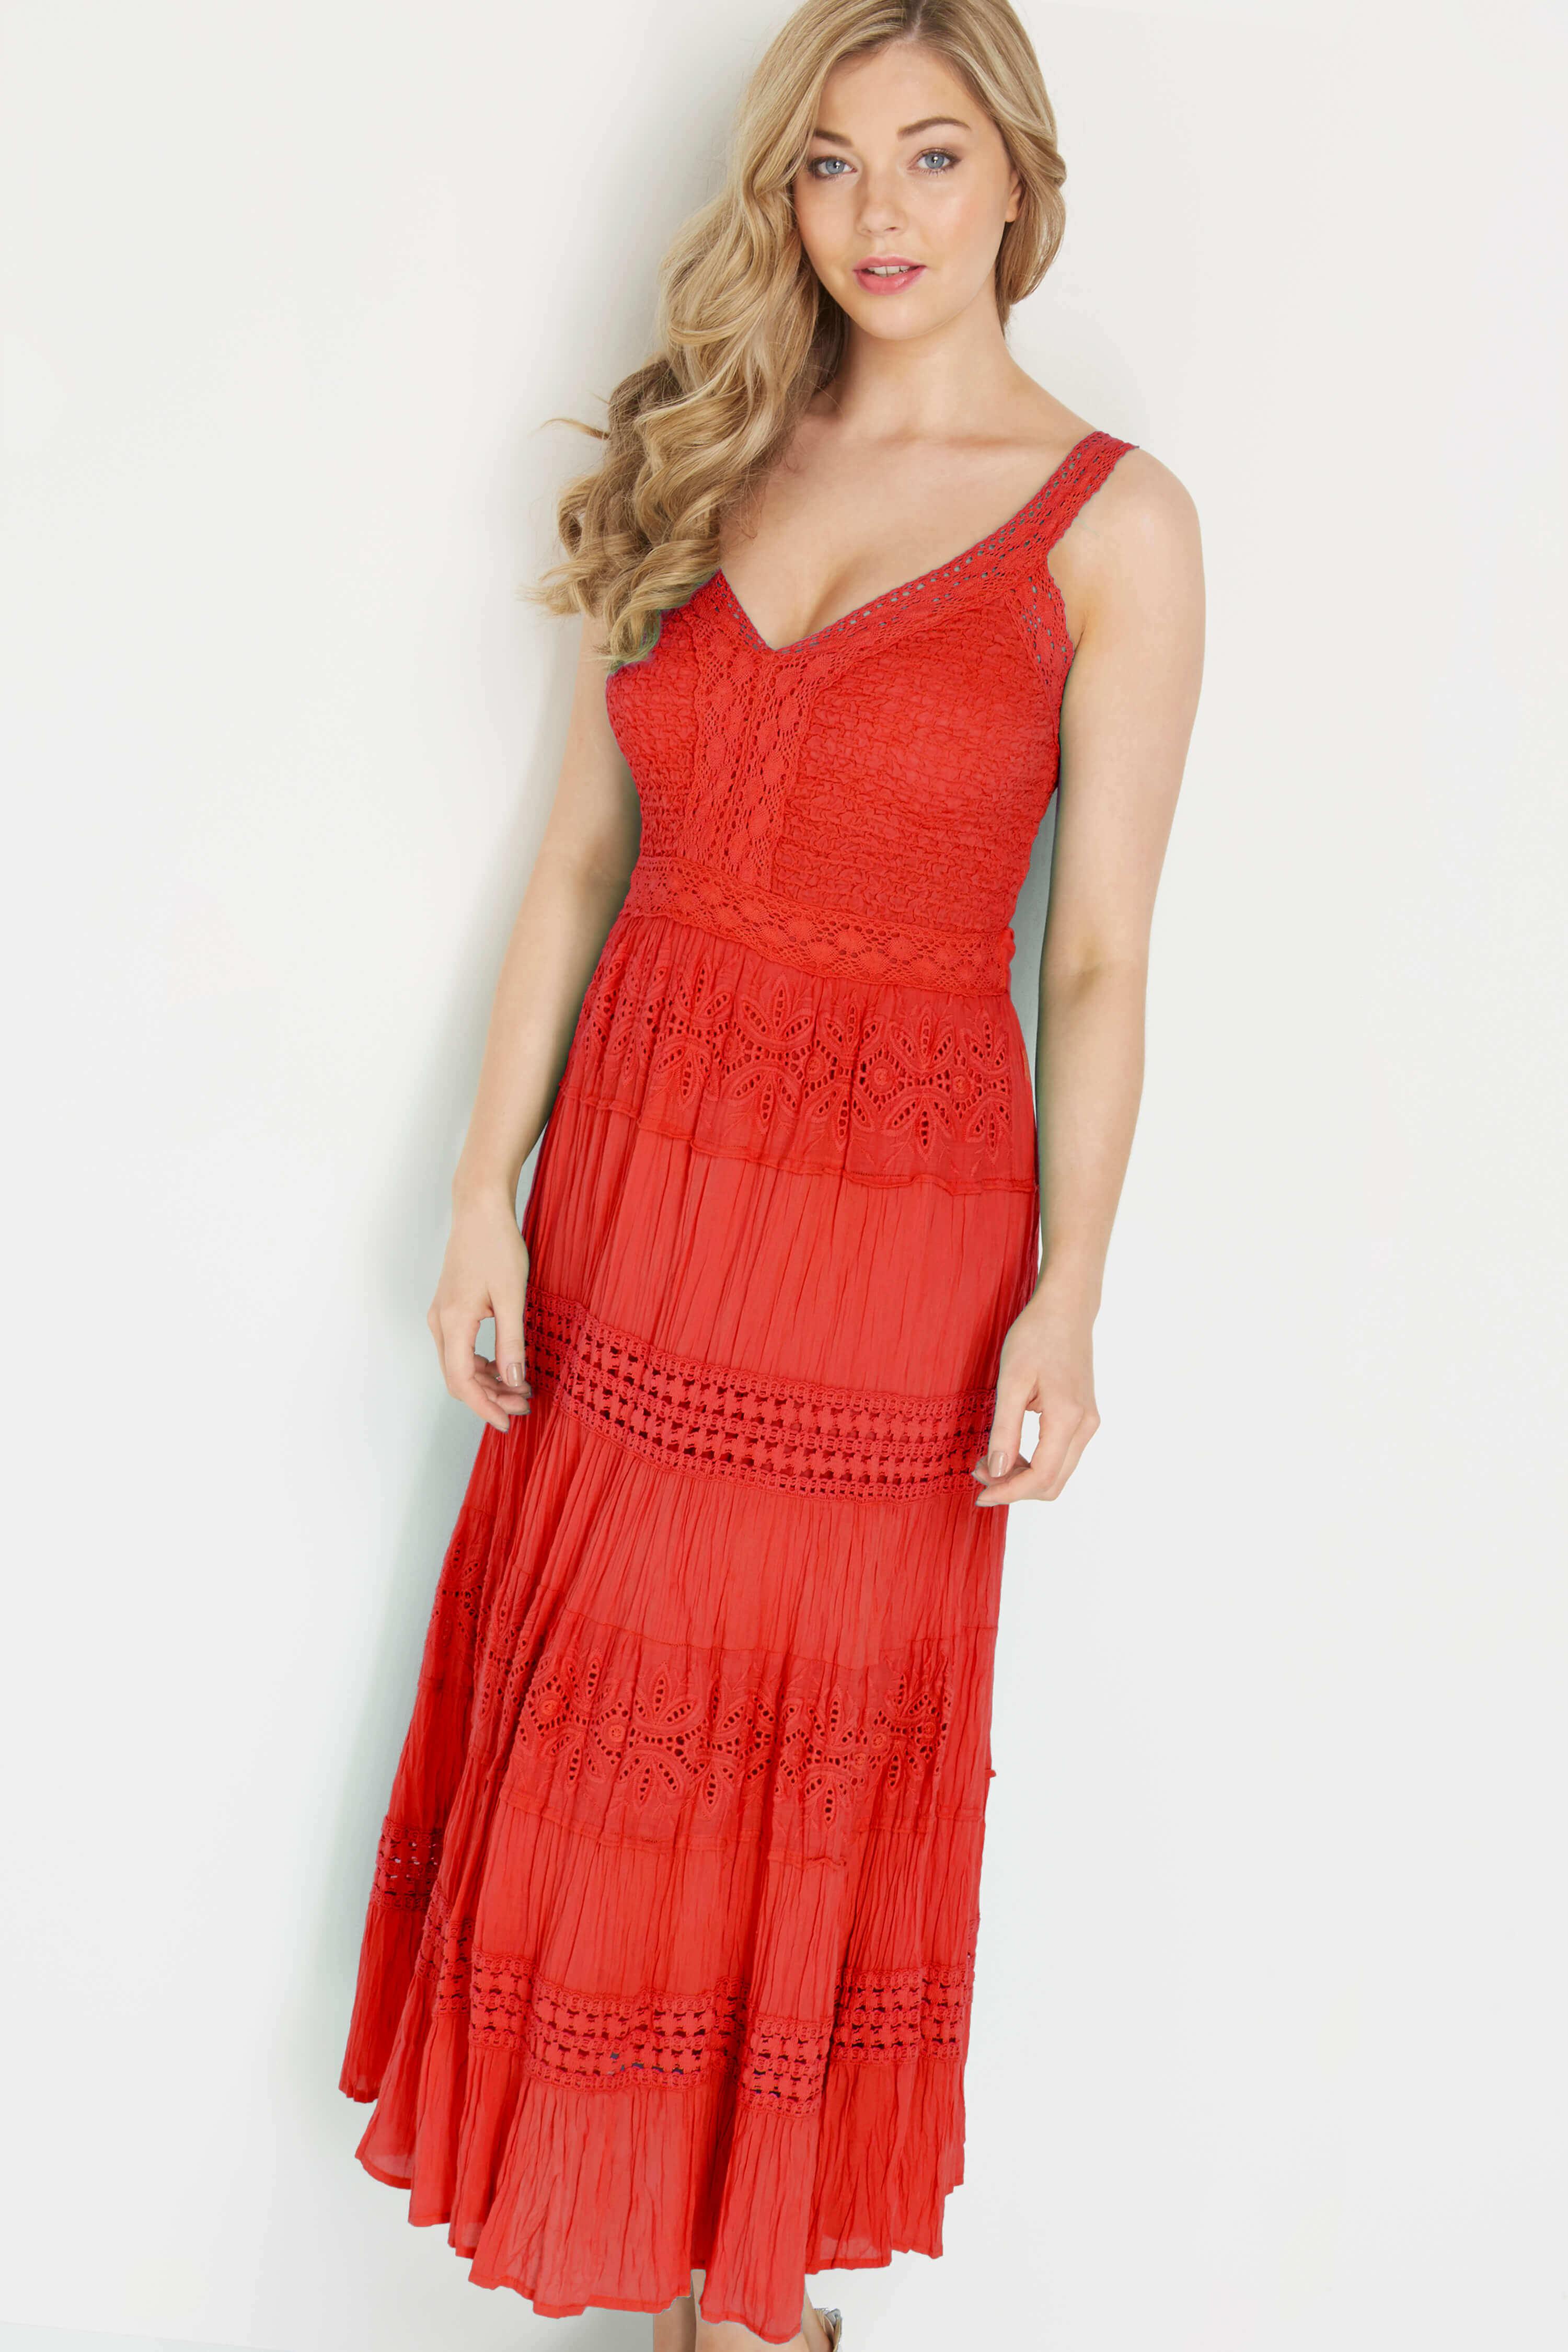 Roman Originals 100% Cotton Summer Maxi Dress in Coral